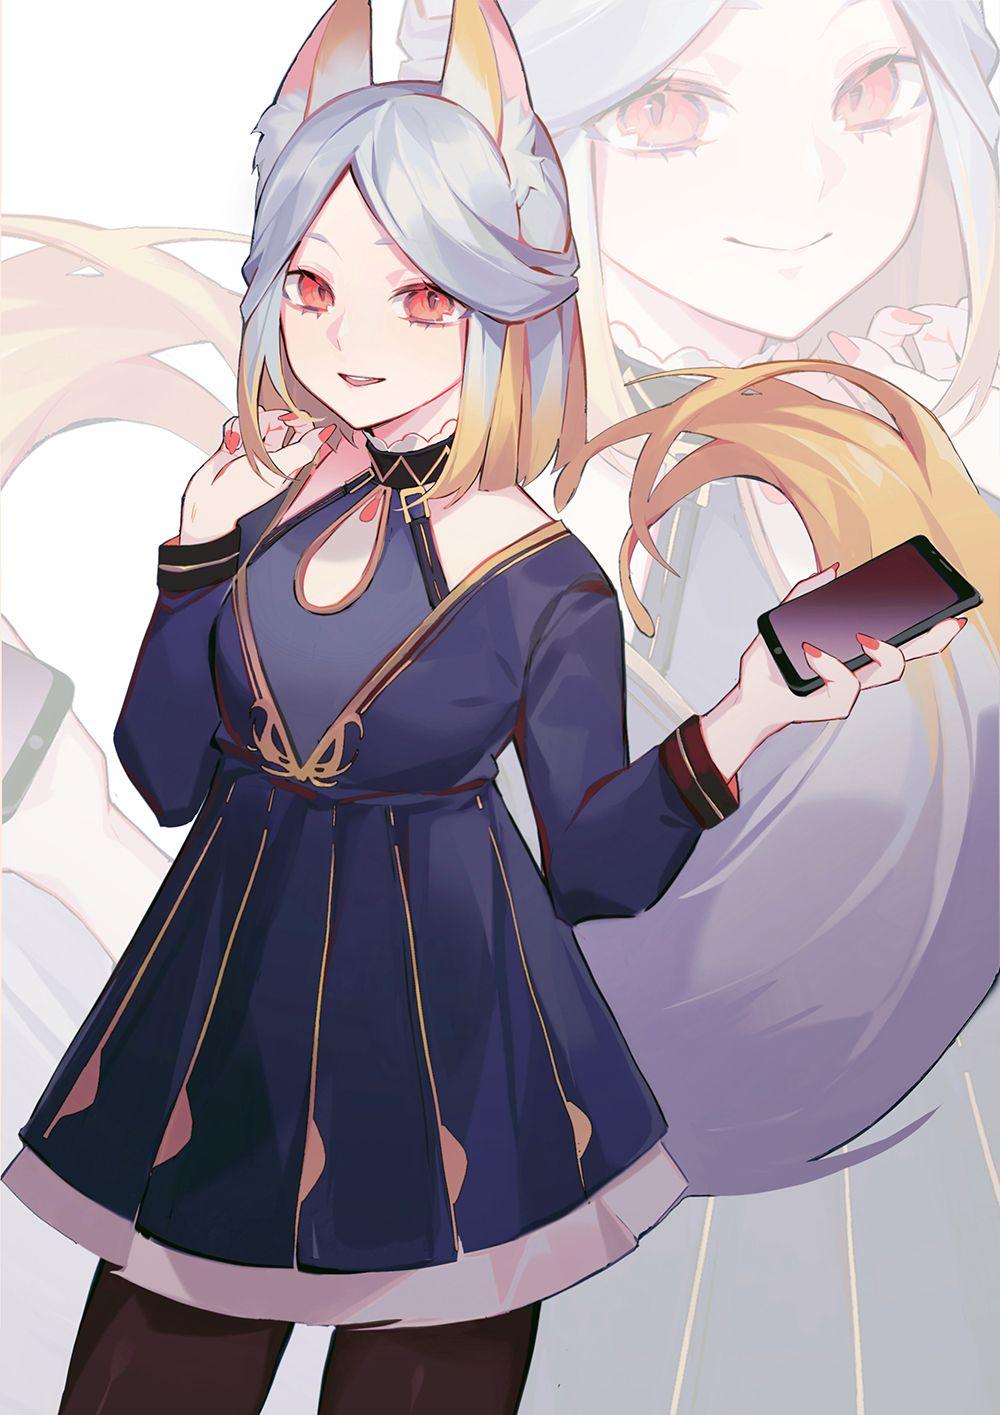 4(ж) - 307 фотографий   Personagens de anime, Neko-girl